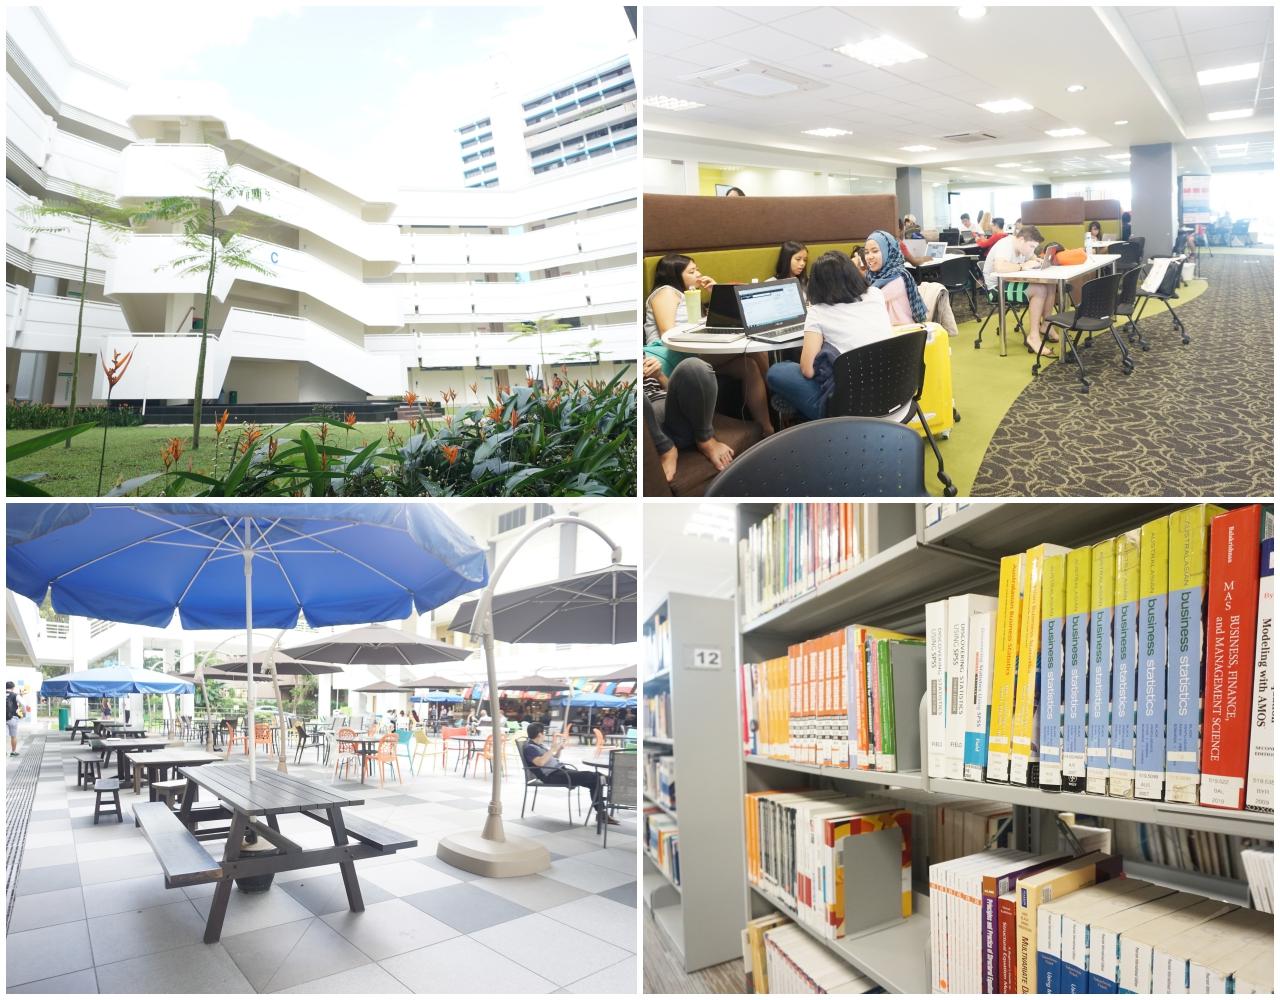 Du học Singapore tại Đại học James Cook